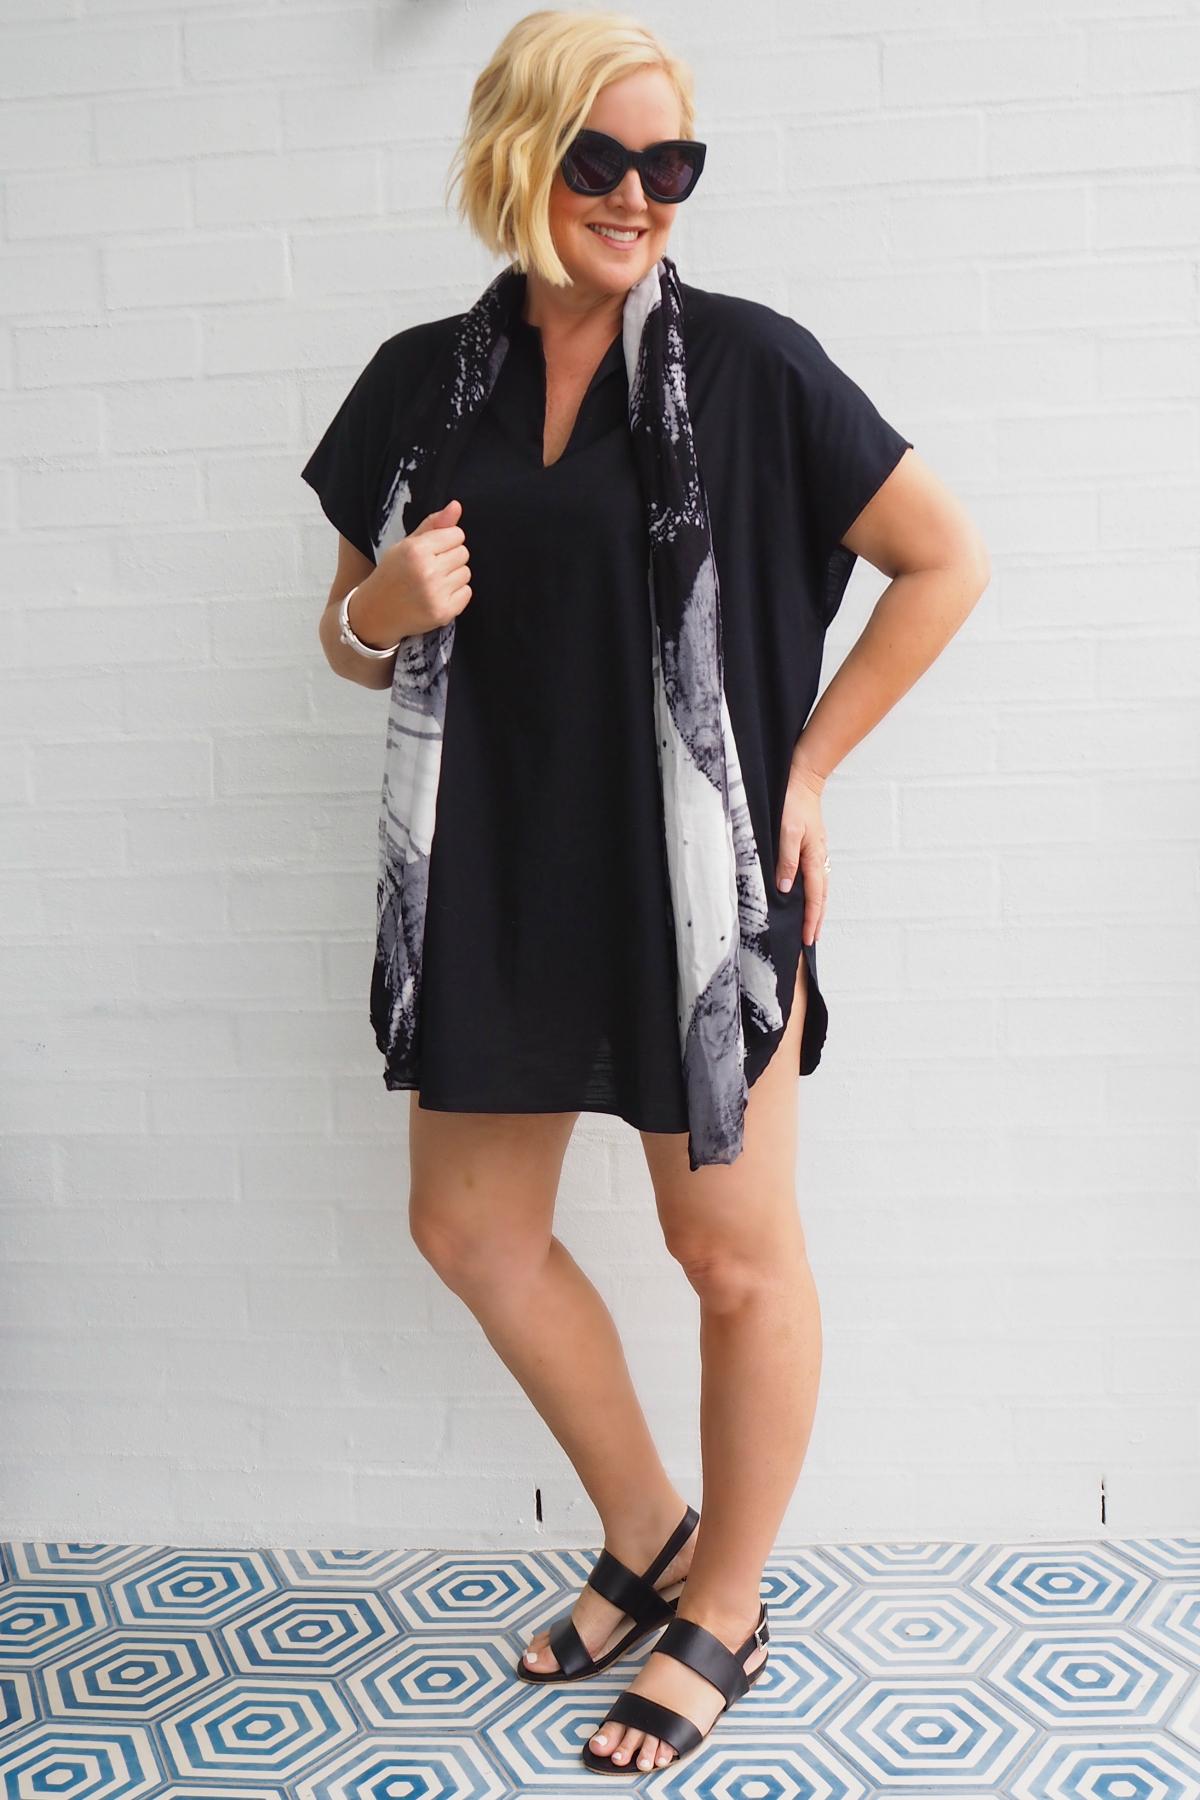 Bombshell Bay dress | Eb & Ive scarf | FRANKiE4 Footwear LiBBi sandals